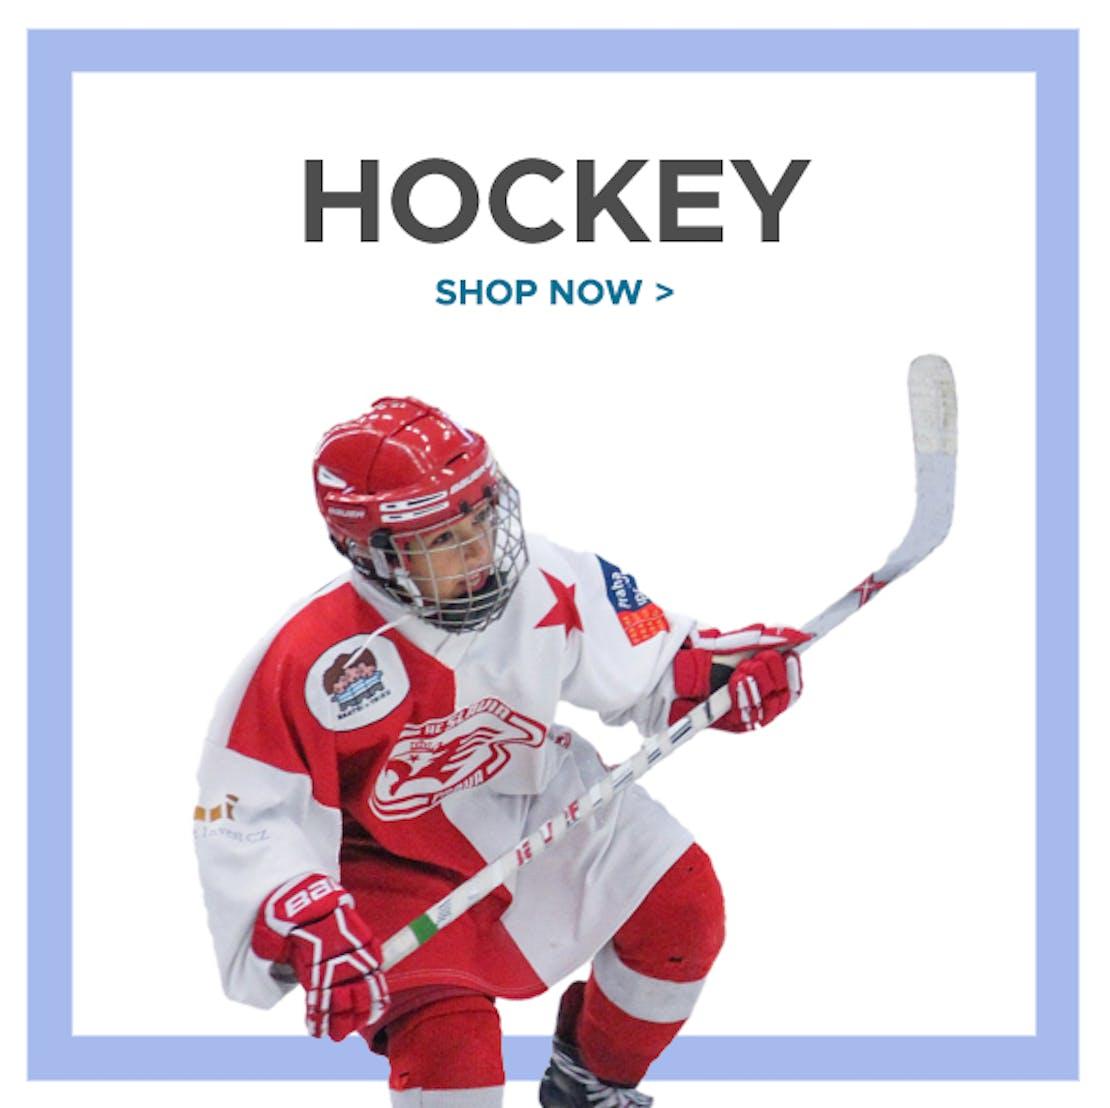 Hockeyguide grid